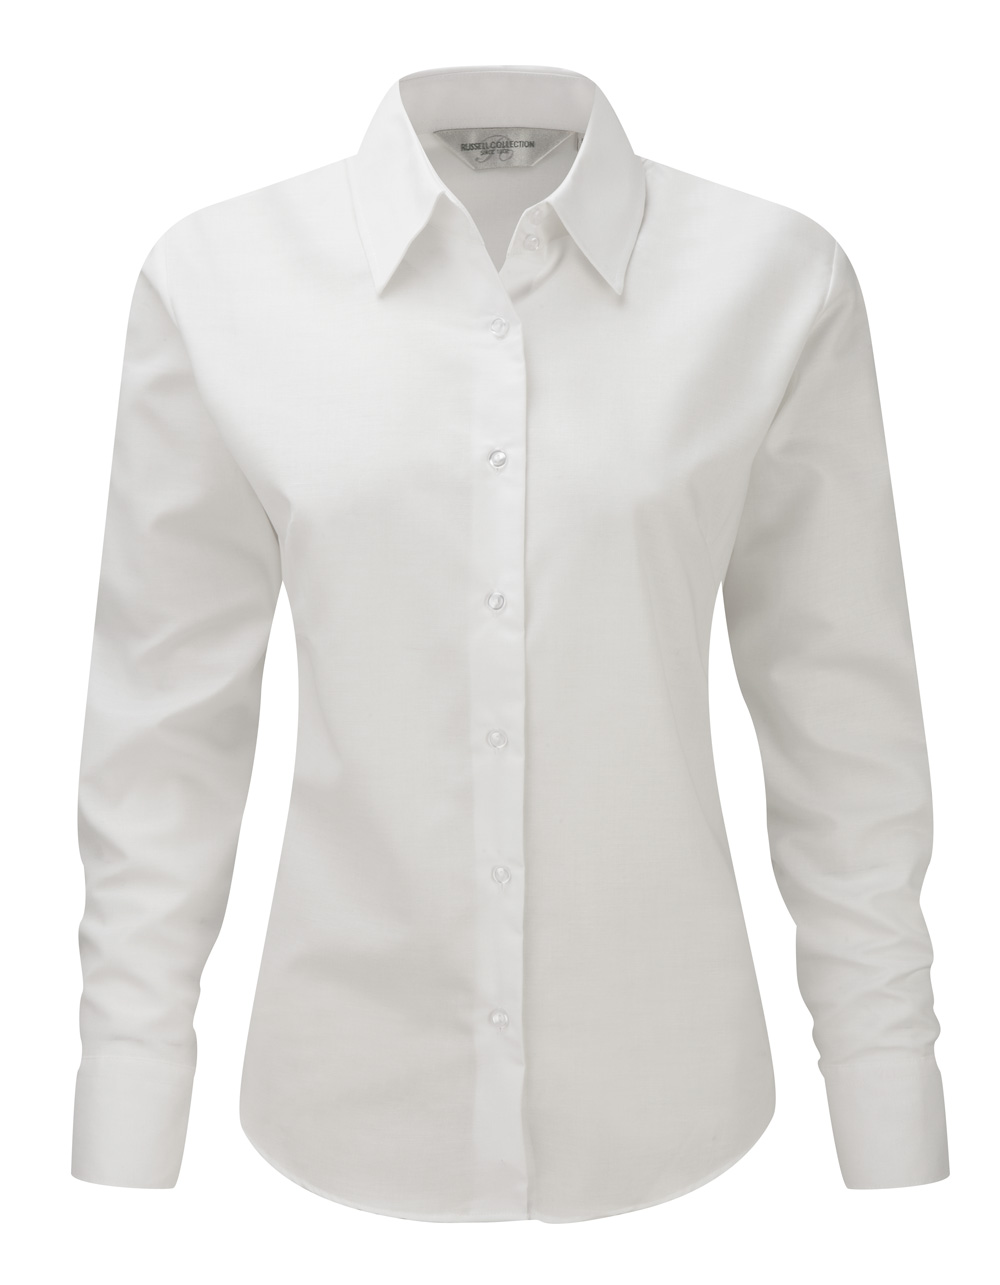 langarm bluse weiß